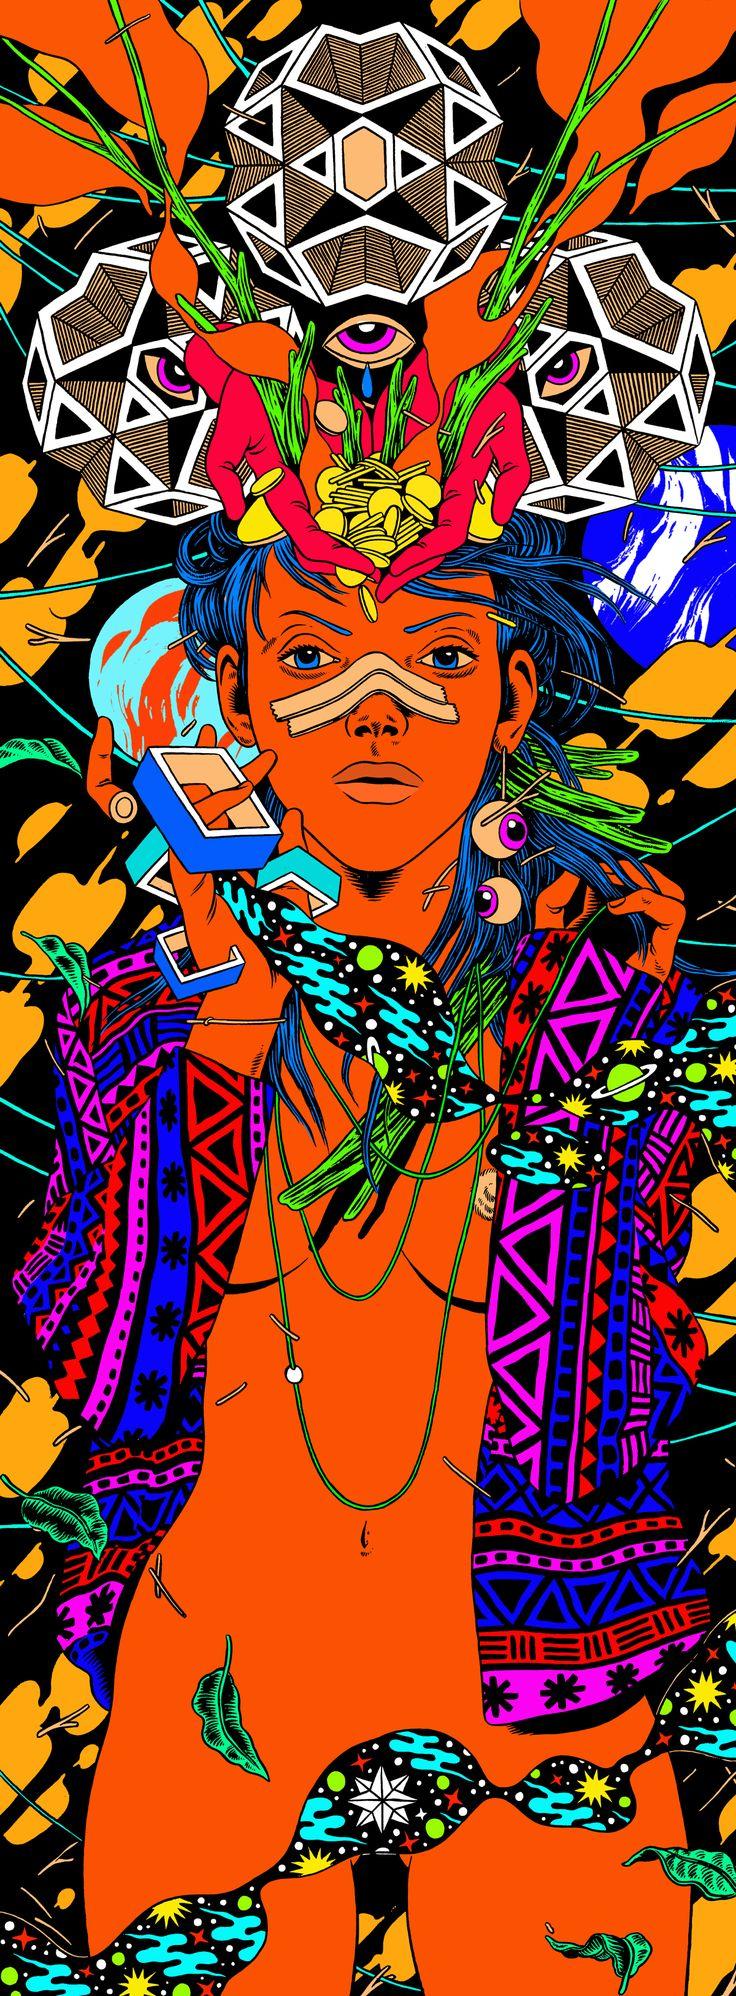 Amazing poster by Bicicleta Sem Freio - http://bicicletasemfreio.com/ #poster #BicicletaSemFreio